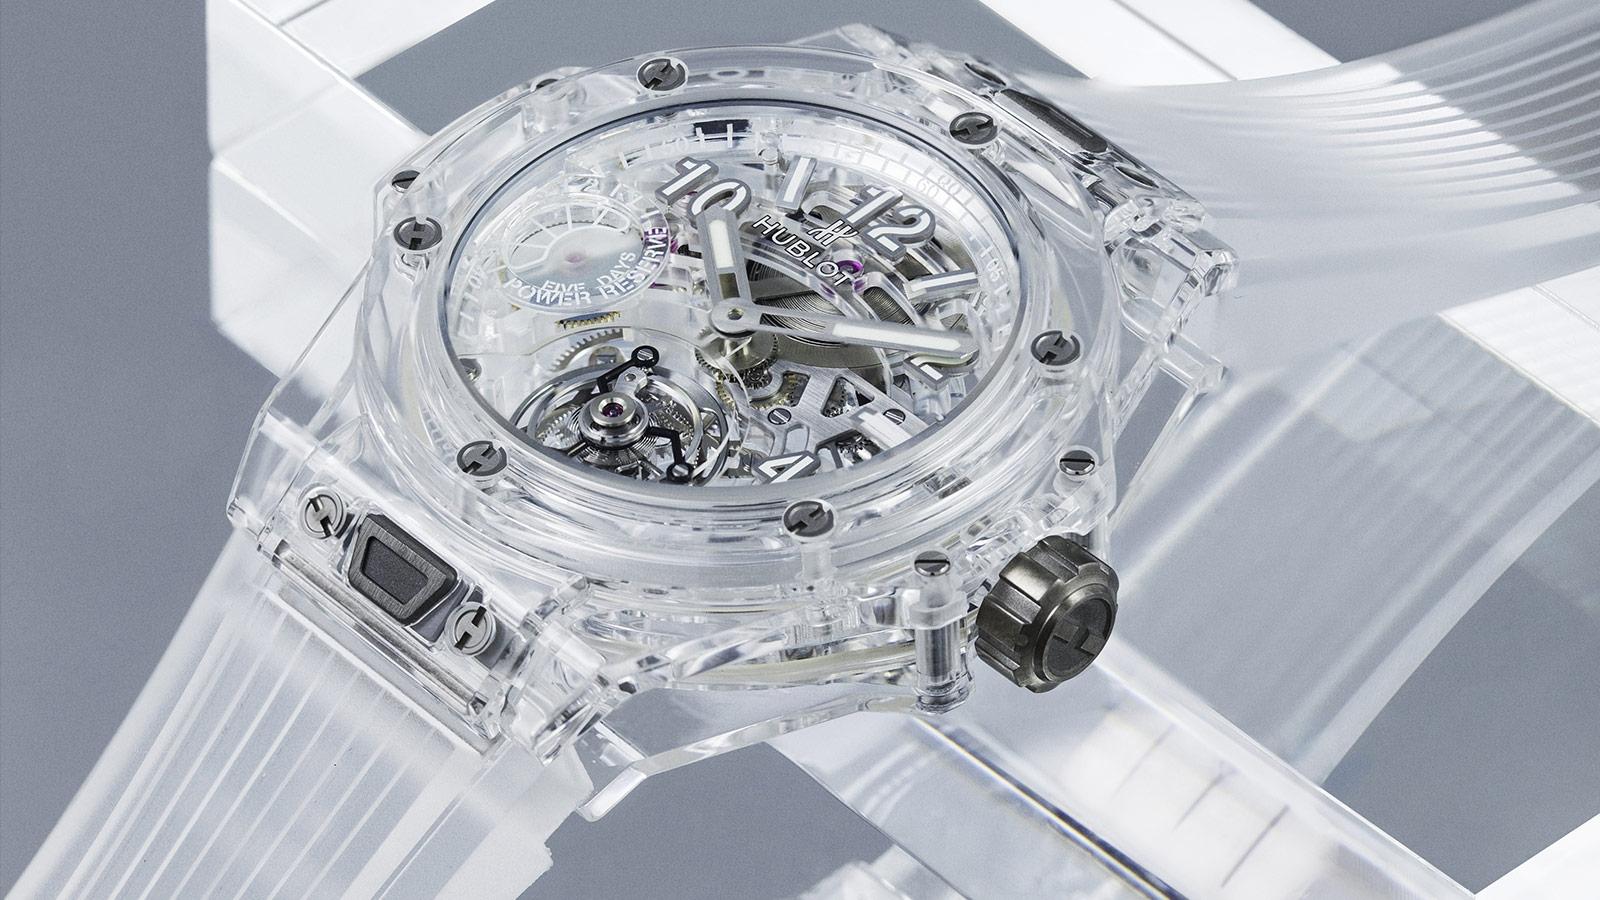 big bang sapphire tourbillon 110